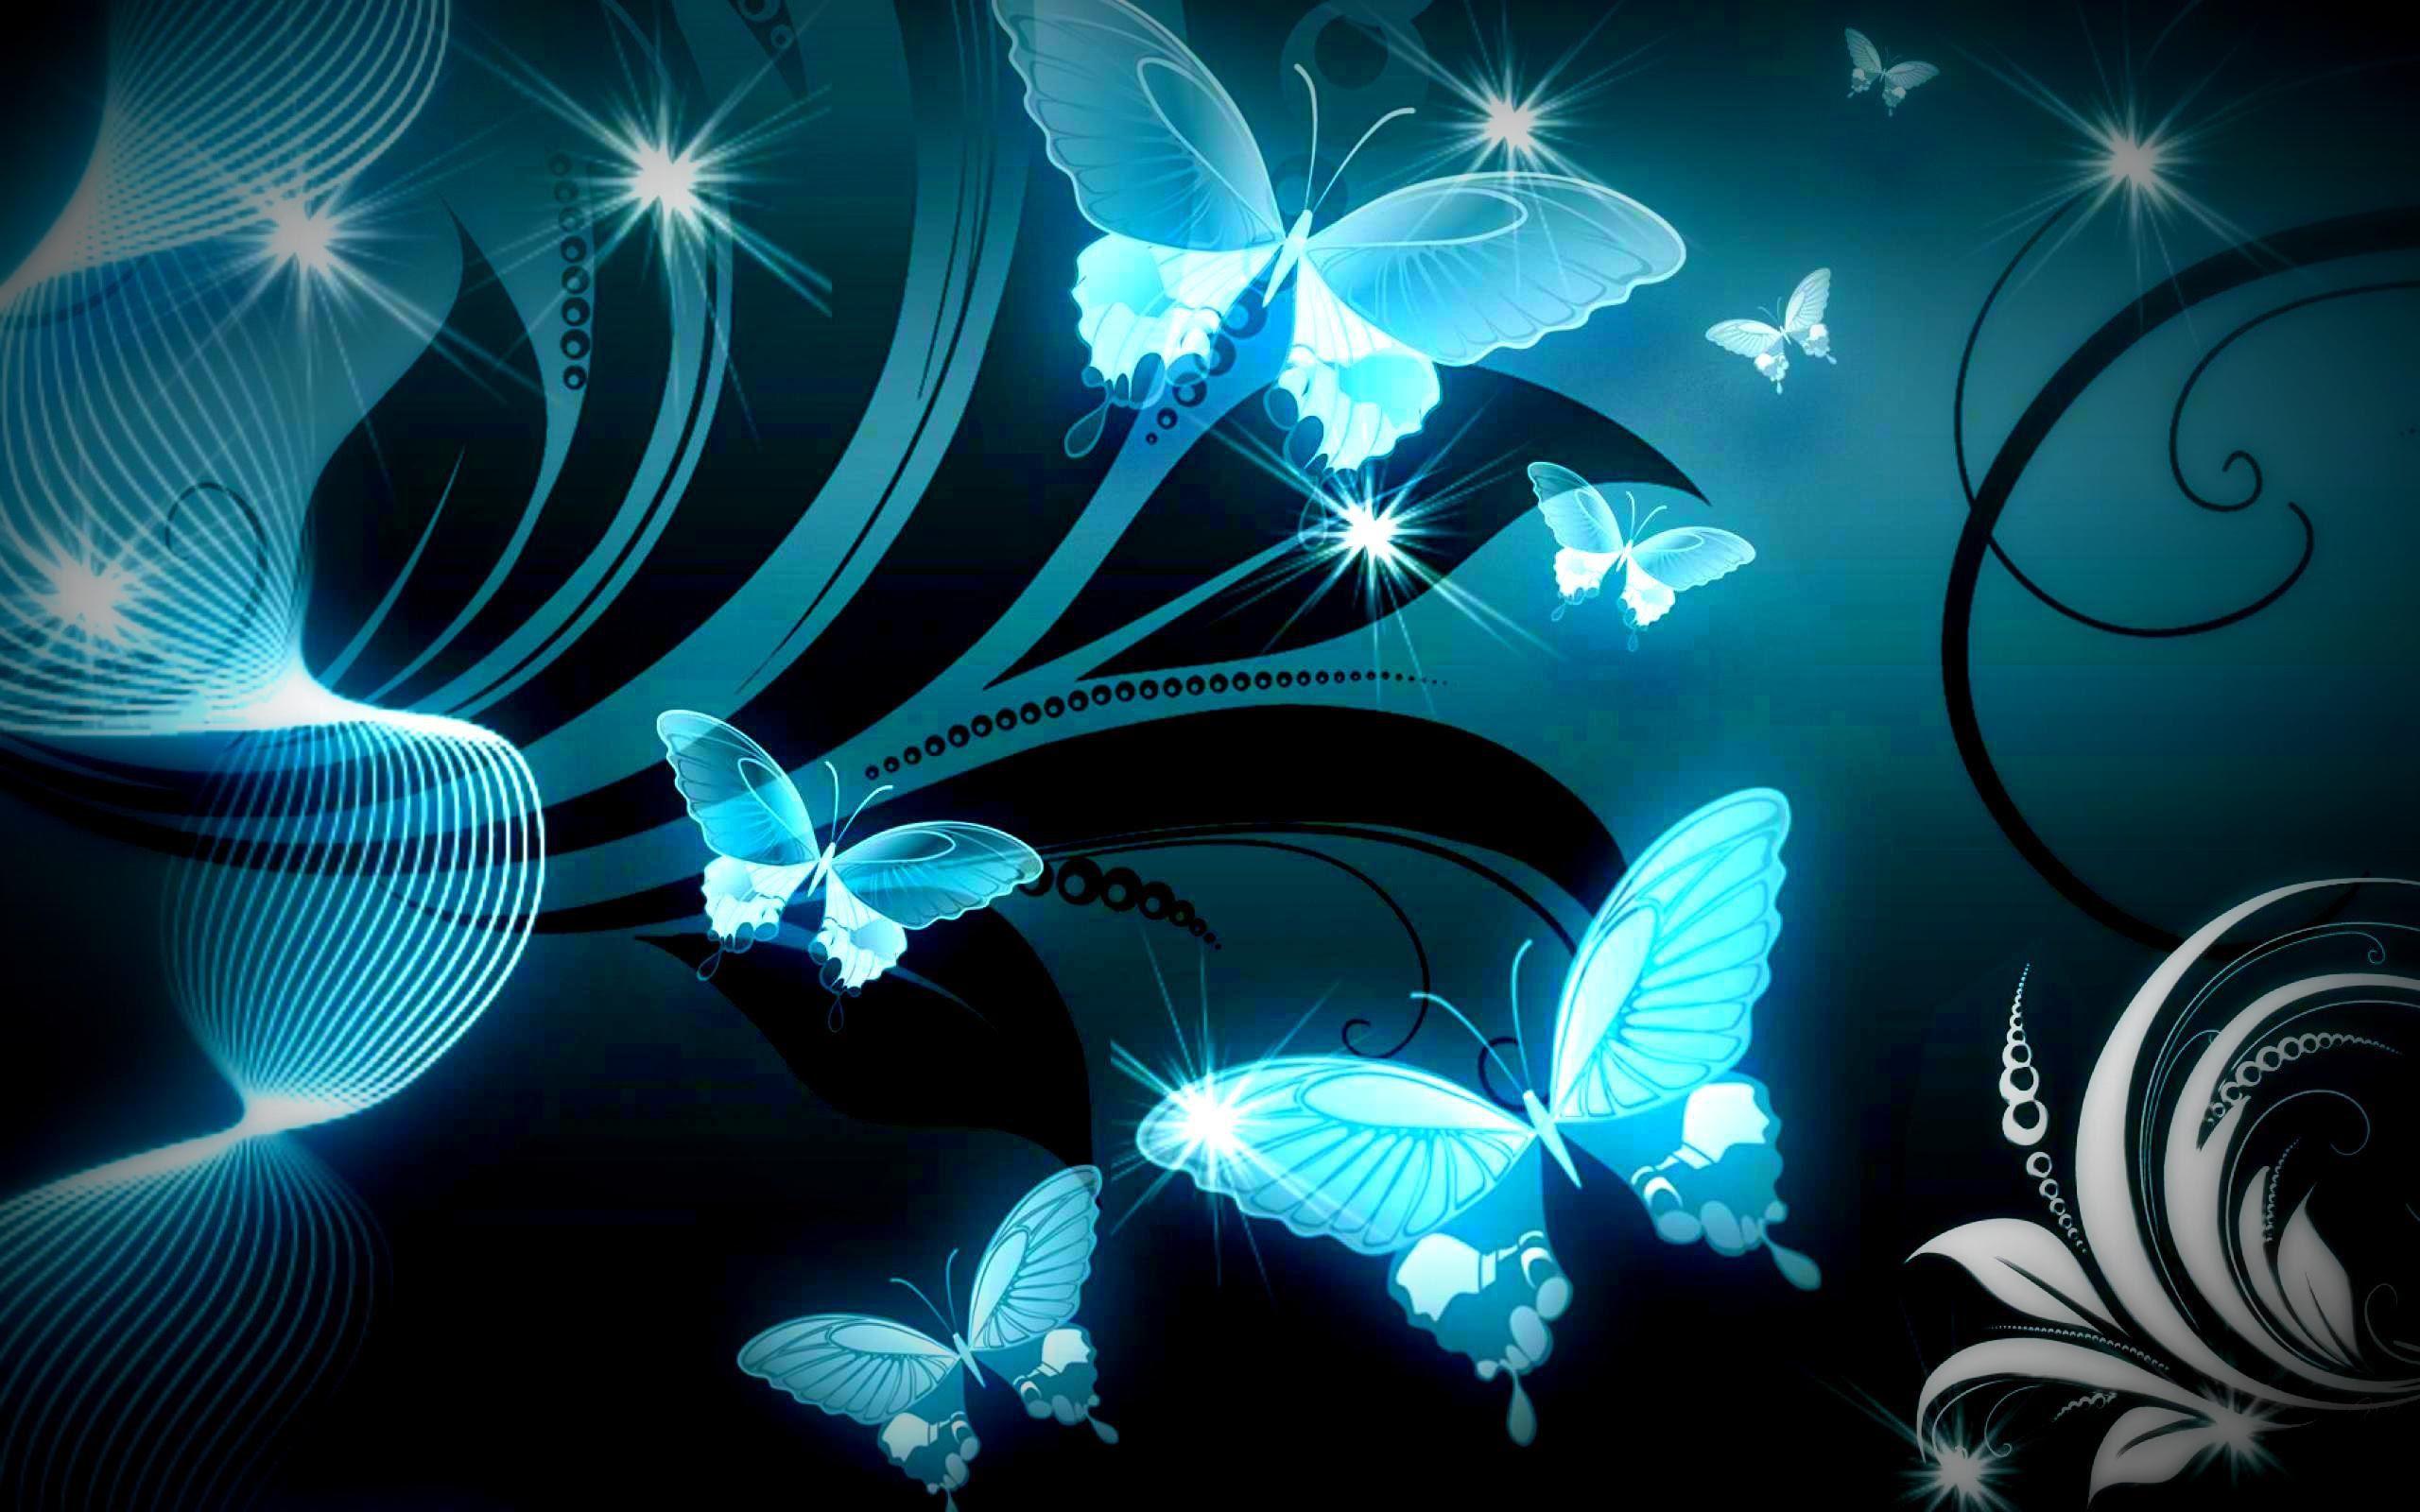 Best Of Blue Butterfly Wallpaper Iphone X Wallpaper Theme Walls